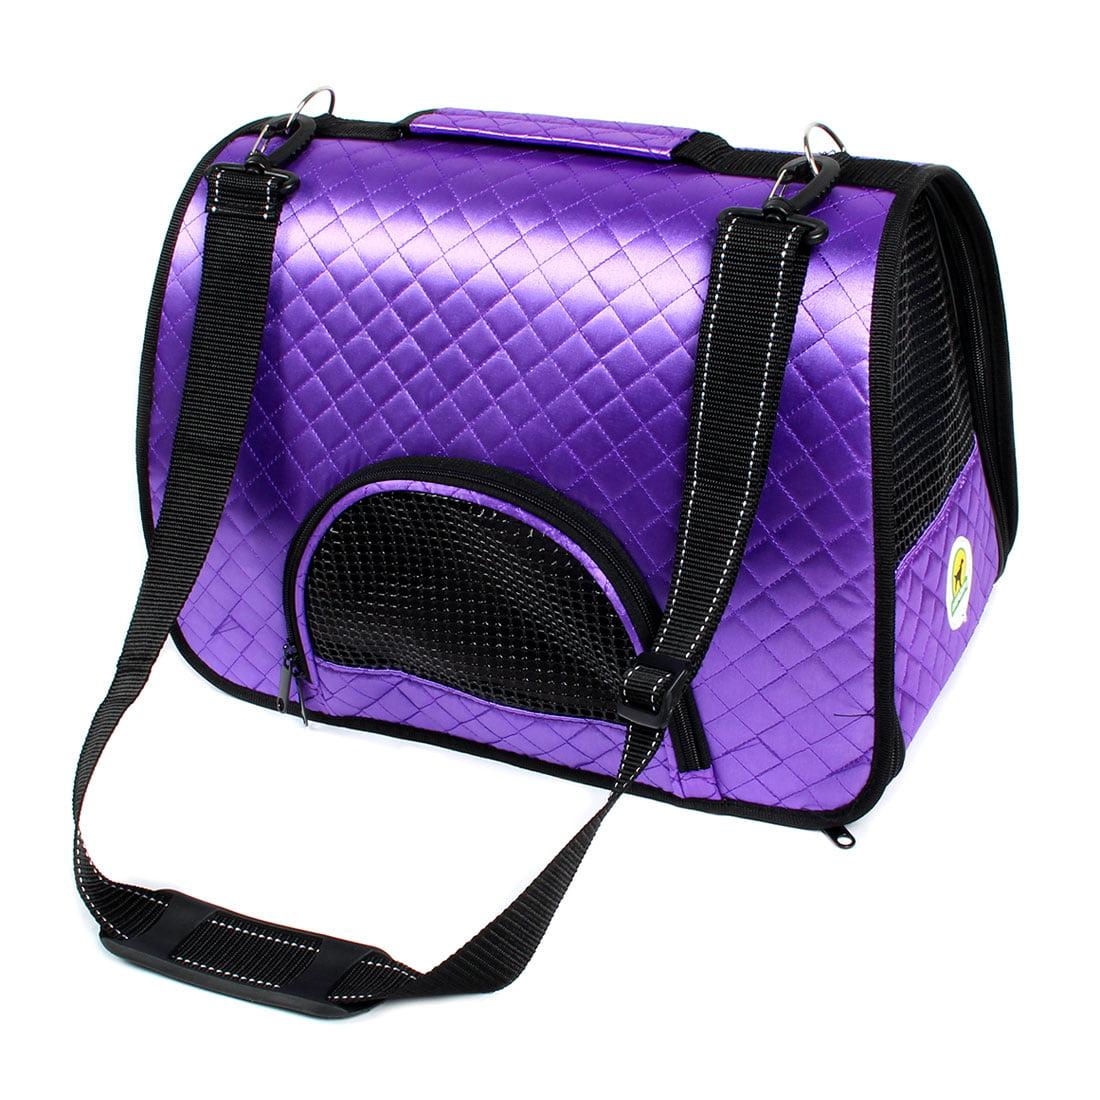 Outdoor Travel Nylon Meshy Zipper Closure Pocket Design Pet Dog Carrier Tote Bag